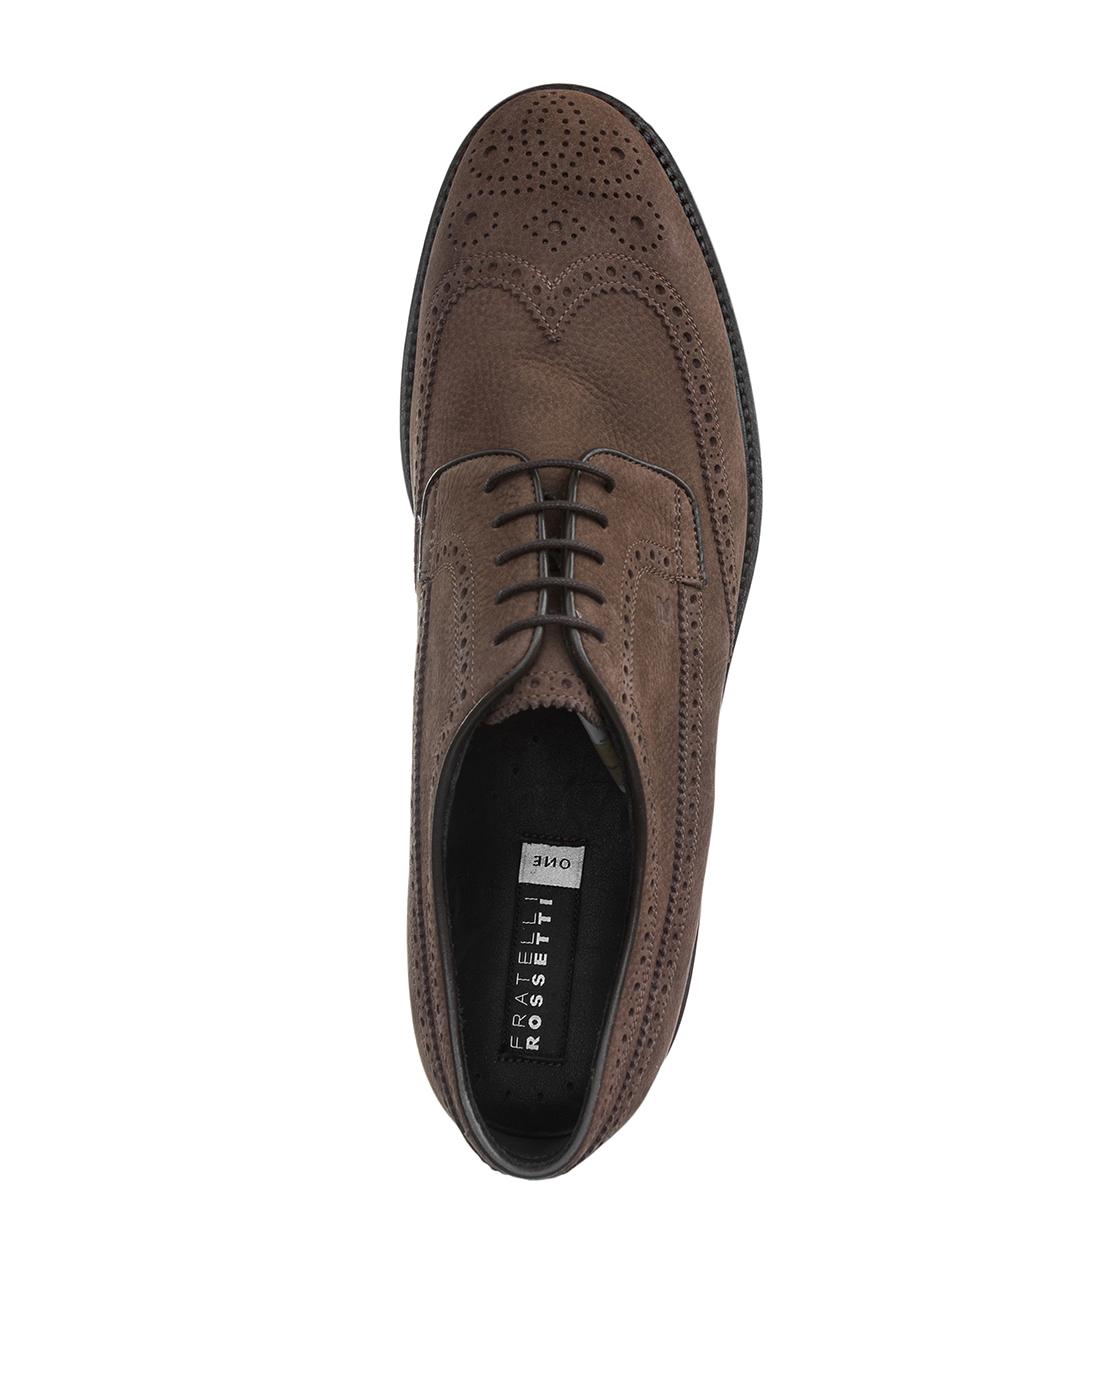 Туфли бежевые мужские Fratelli Rossetti S45900-5